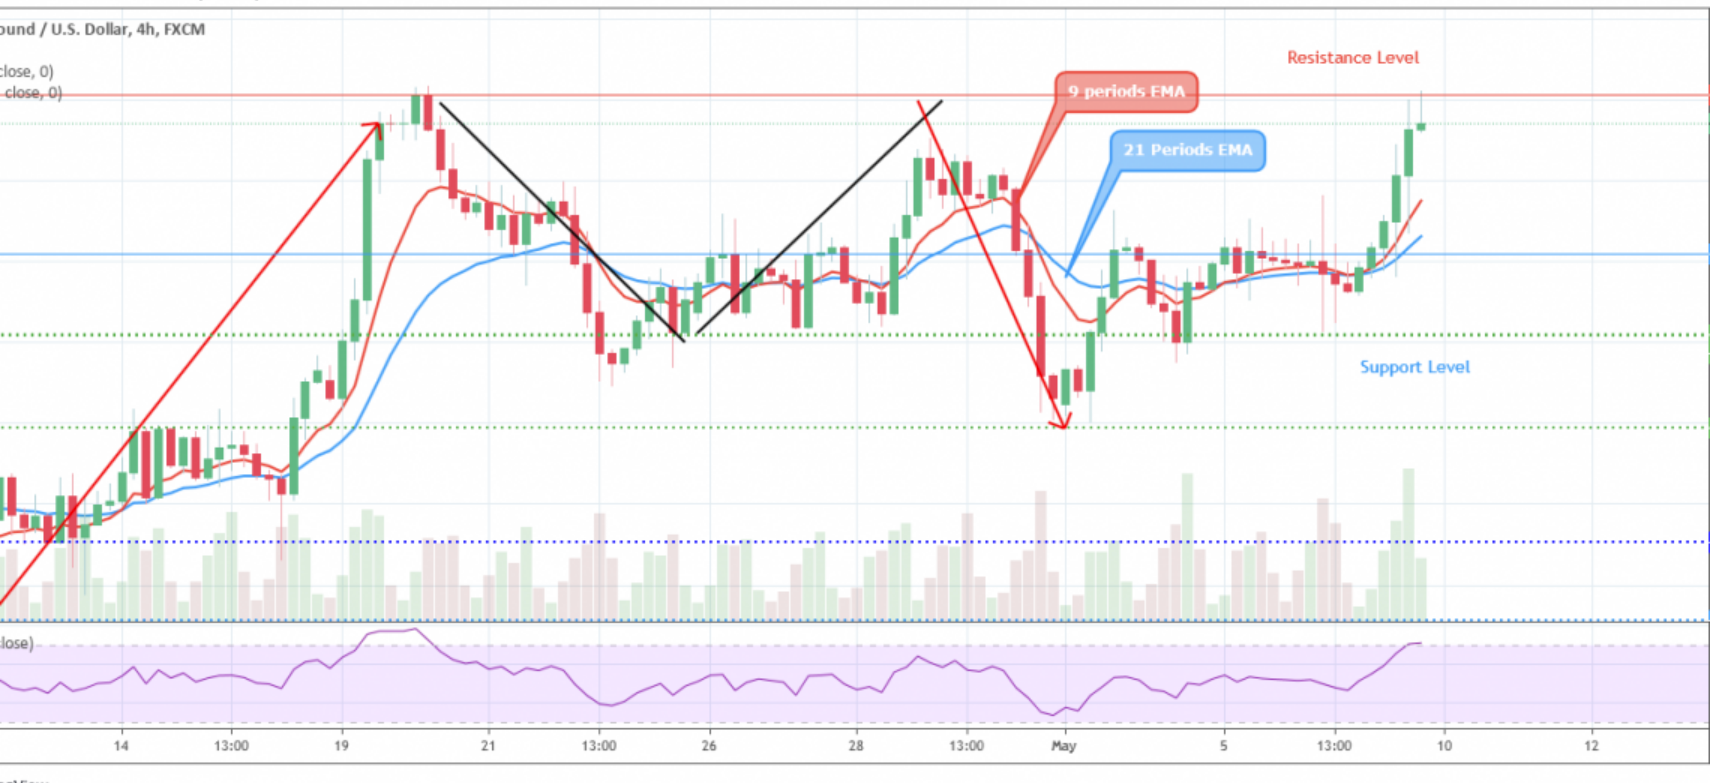 GBPUSD Price Retests $1.40 Level